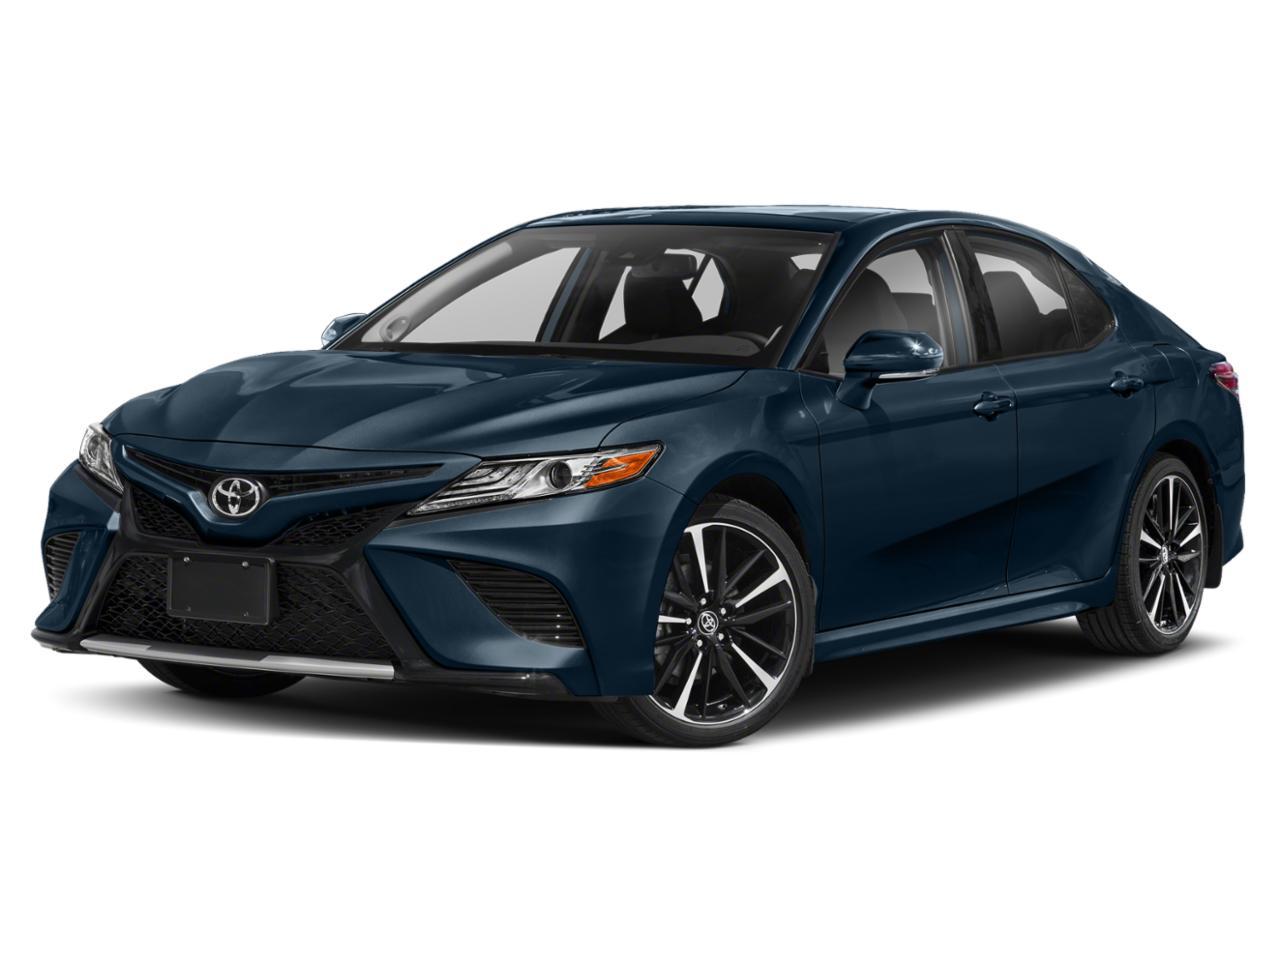 2019 Toyota Camry XSE V6 4dr Car Slide